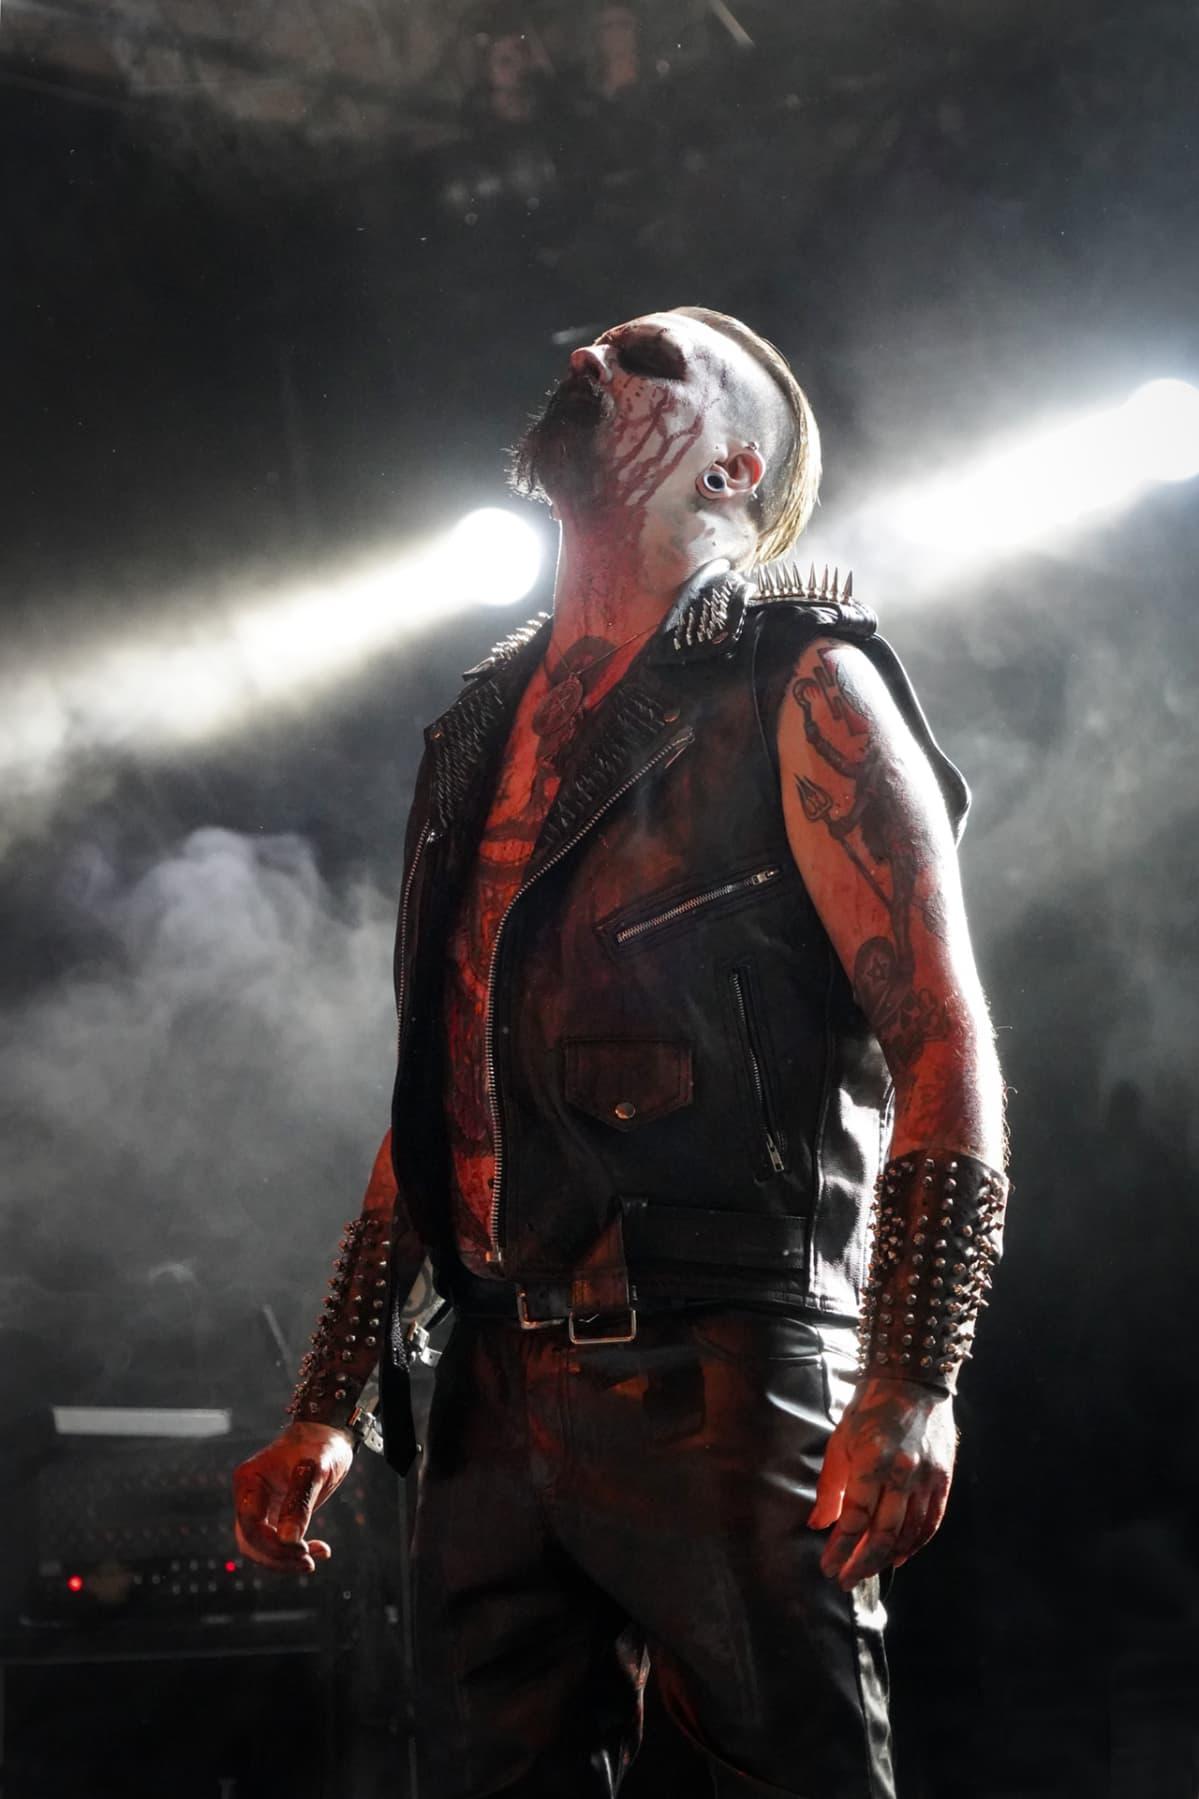 Spellgoth, SG.7, Tuomas Rytkönen, Trollheims Grott, black metal, Steelfest